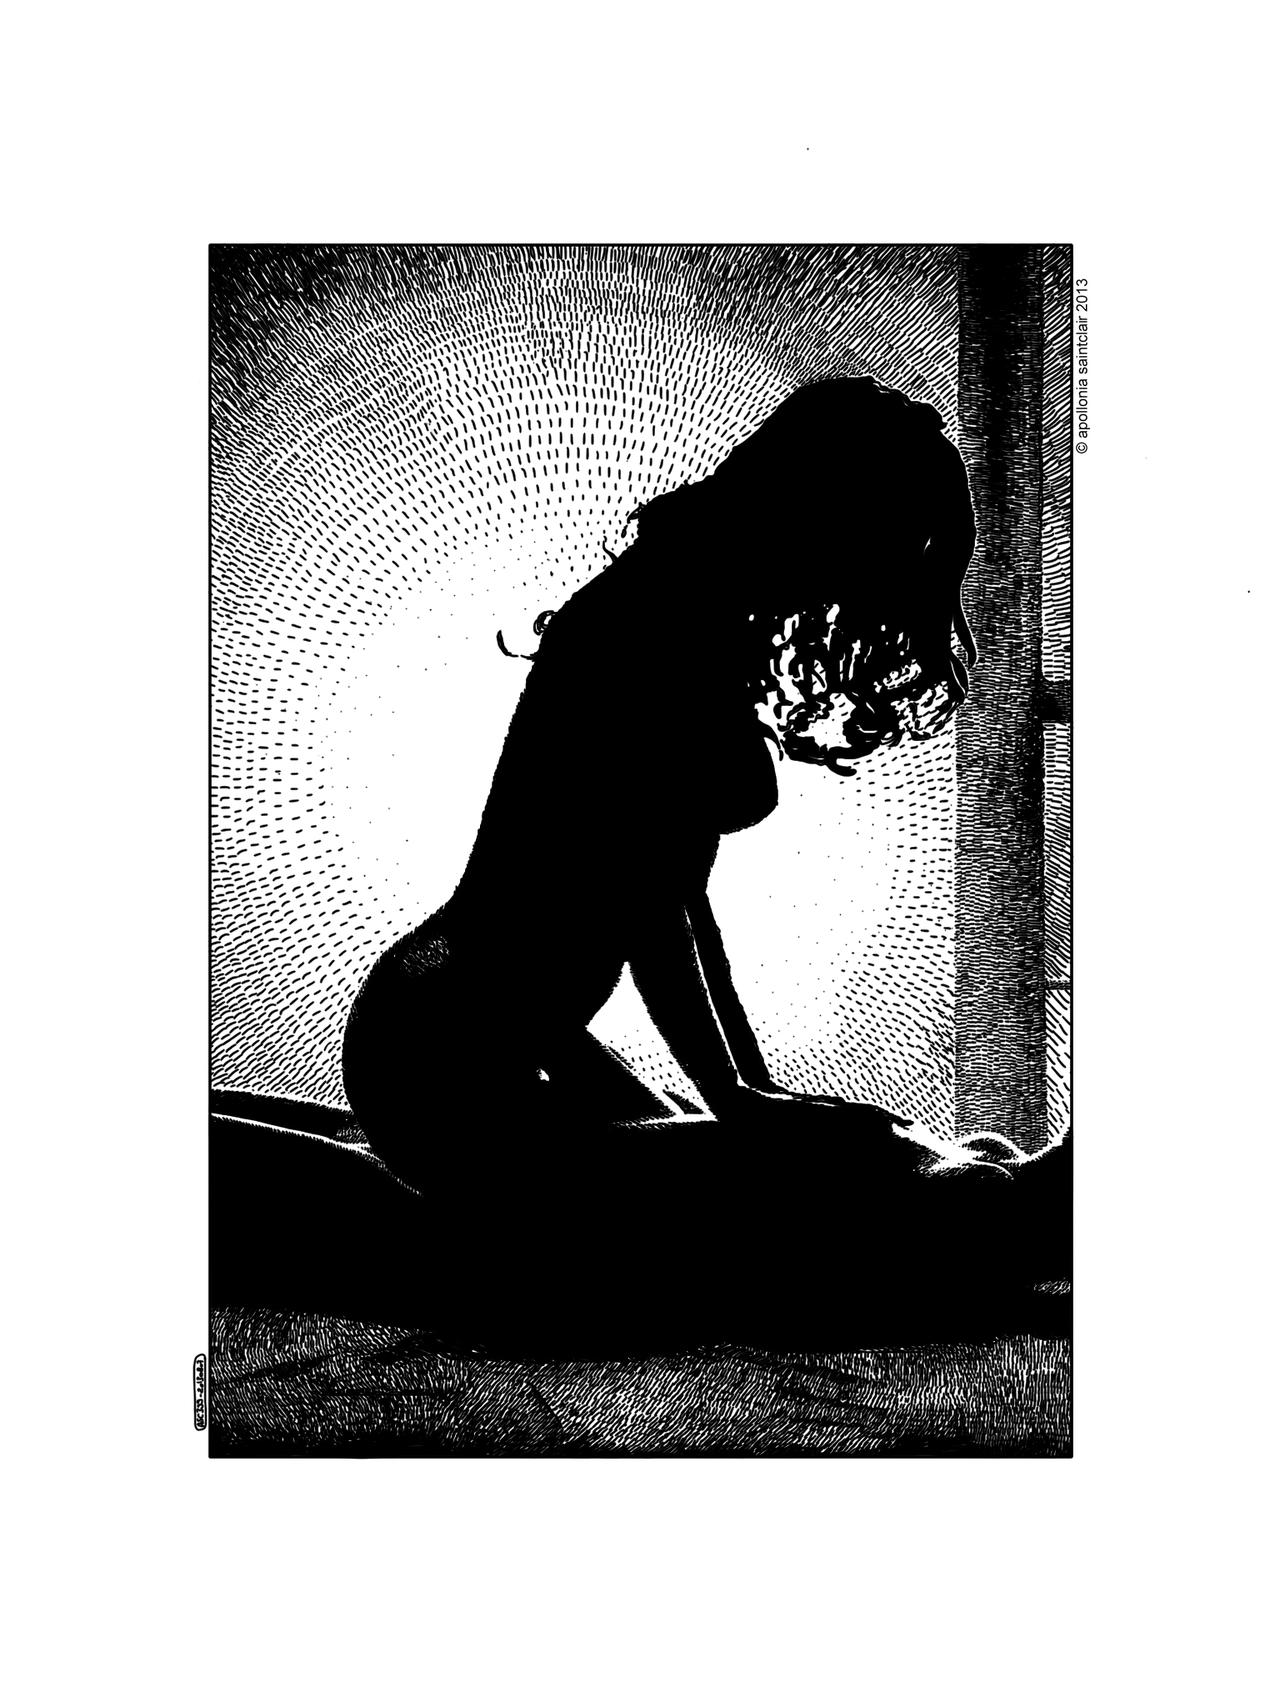 Apollonia Saintclair's Seduction: tumblr_mr6ns39HCR1rojfyfo1_1280.png